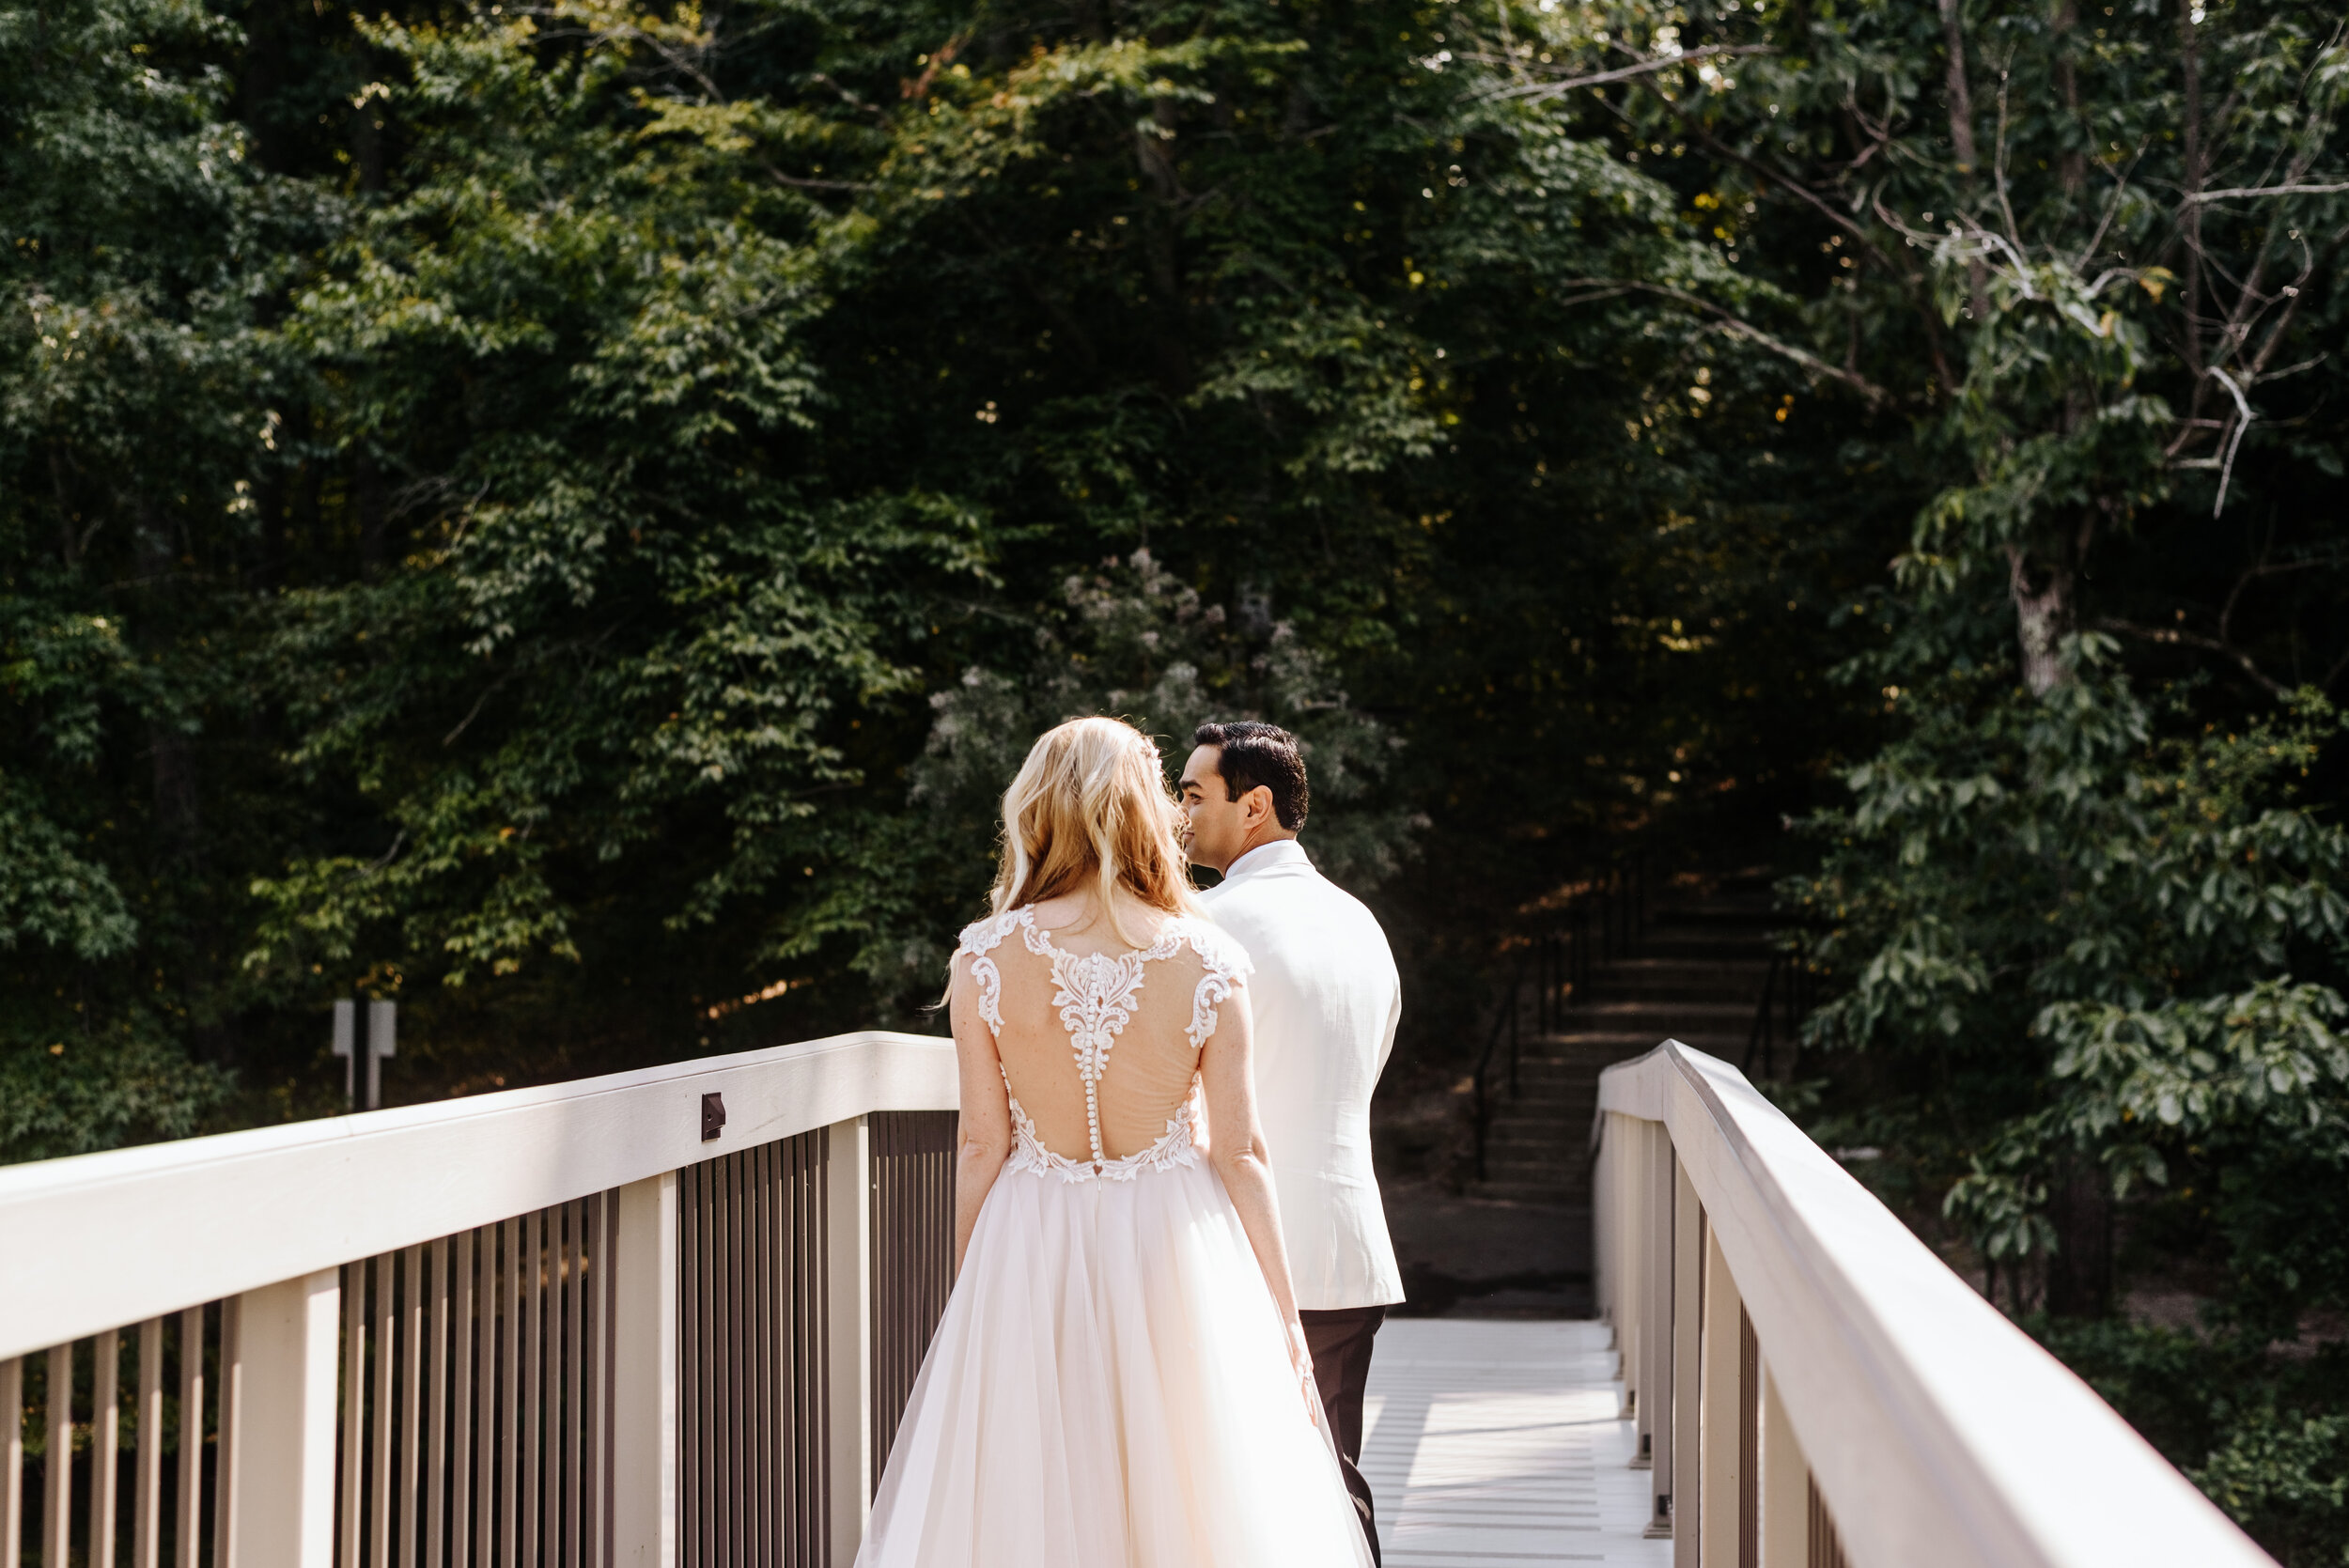 Cassie-Mrunal-Wedding-Quirk-Hotel-John-Marshall-Ballrooms-Richmond-Virginia-Photography-by-V-39.jpg